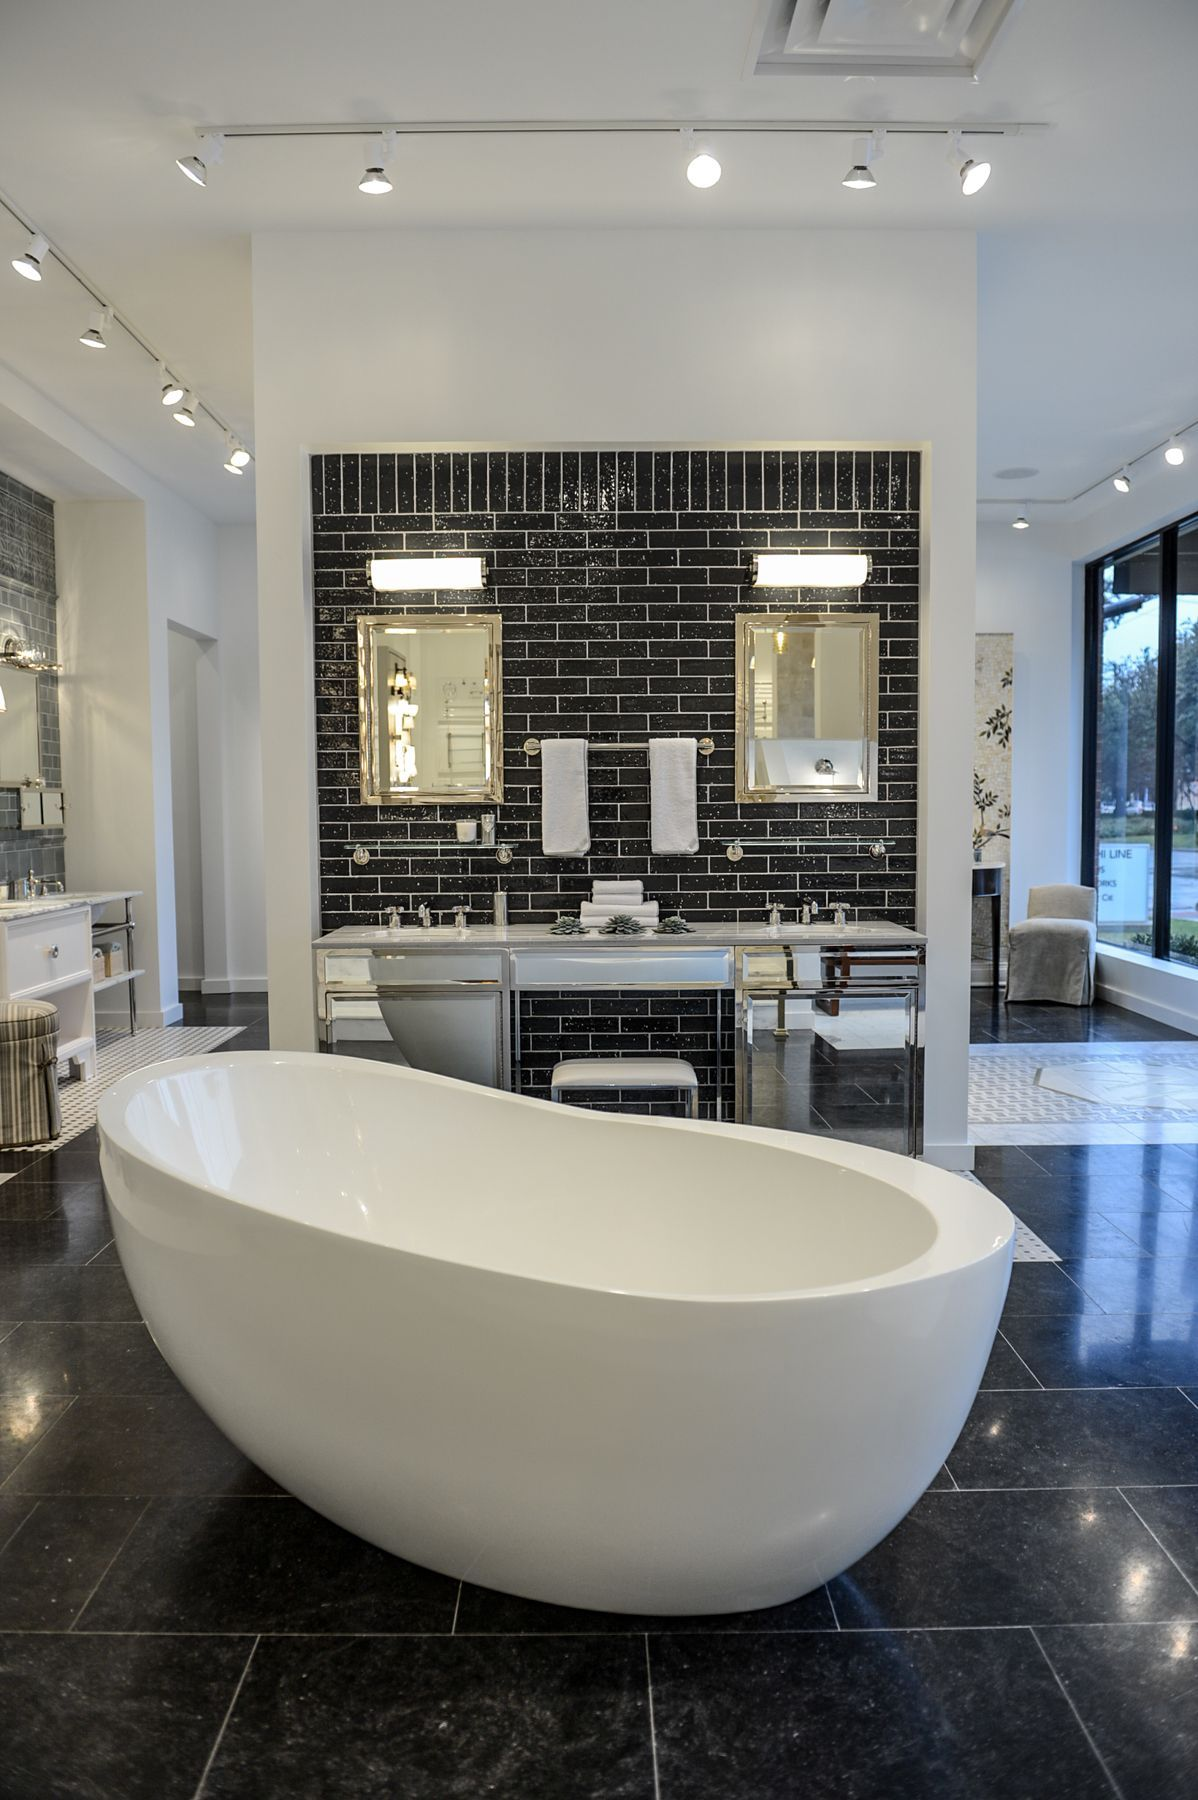 25 Bathtub In The Dallas Showroom Bathroomdesignshowroom